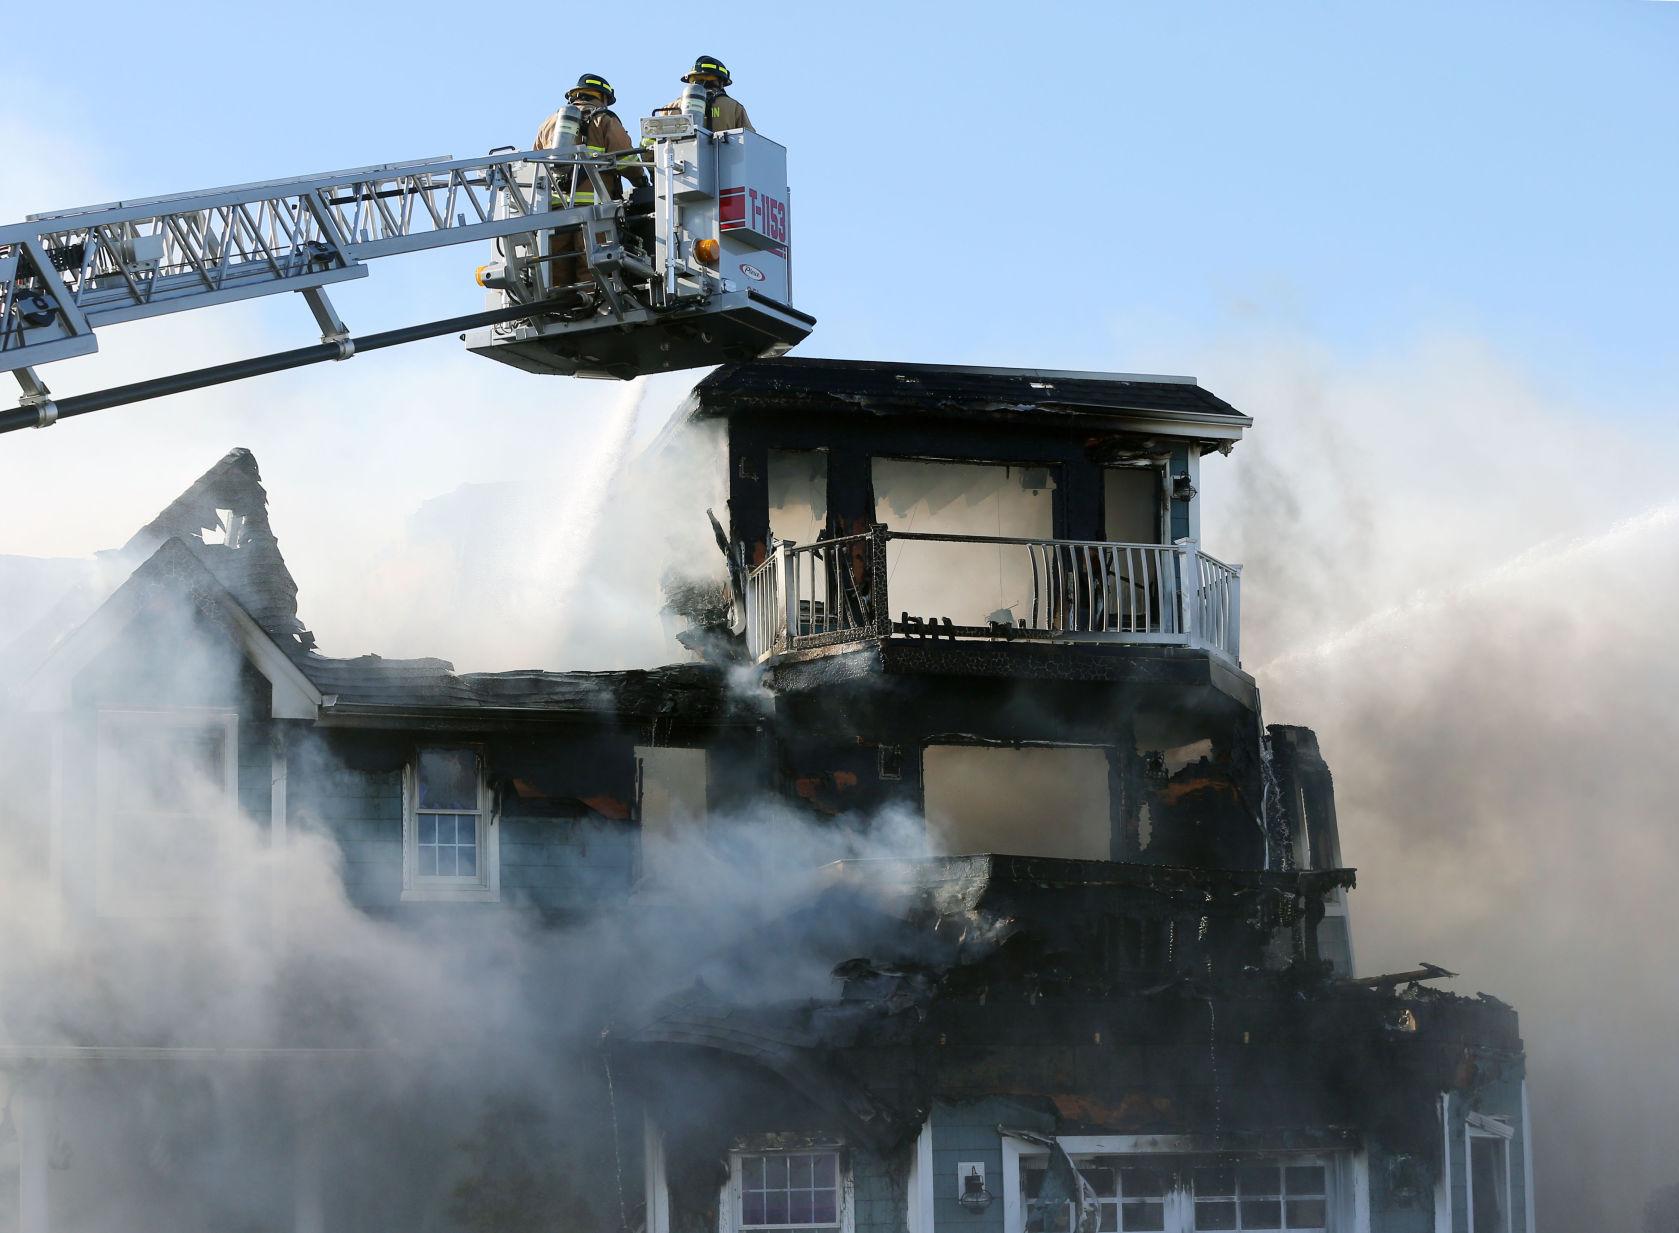 Firefighters battle blaze at 2 Jersey Shore bayfront homes